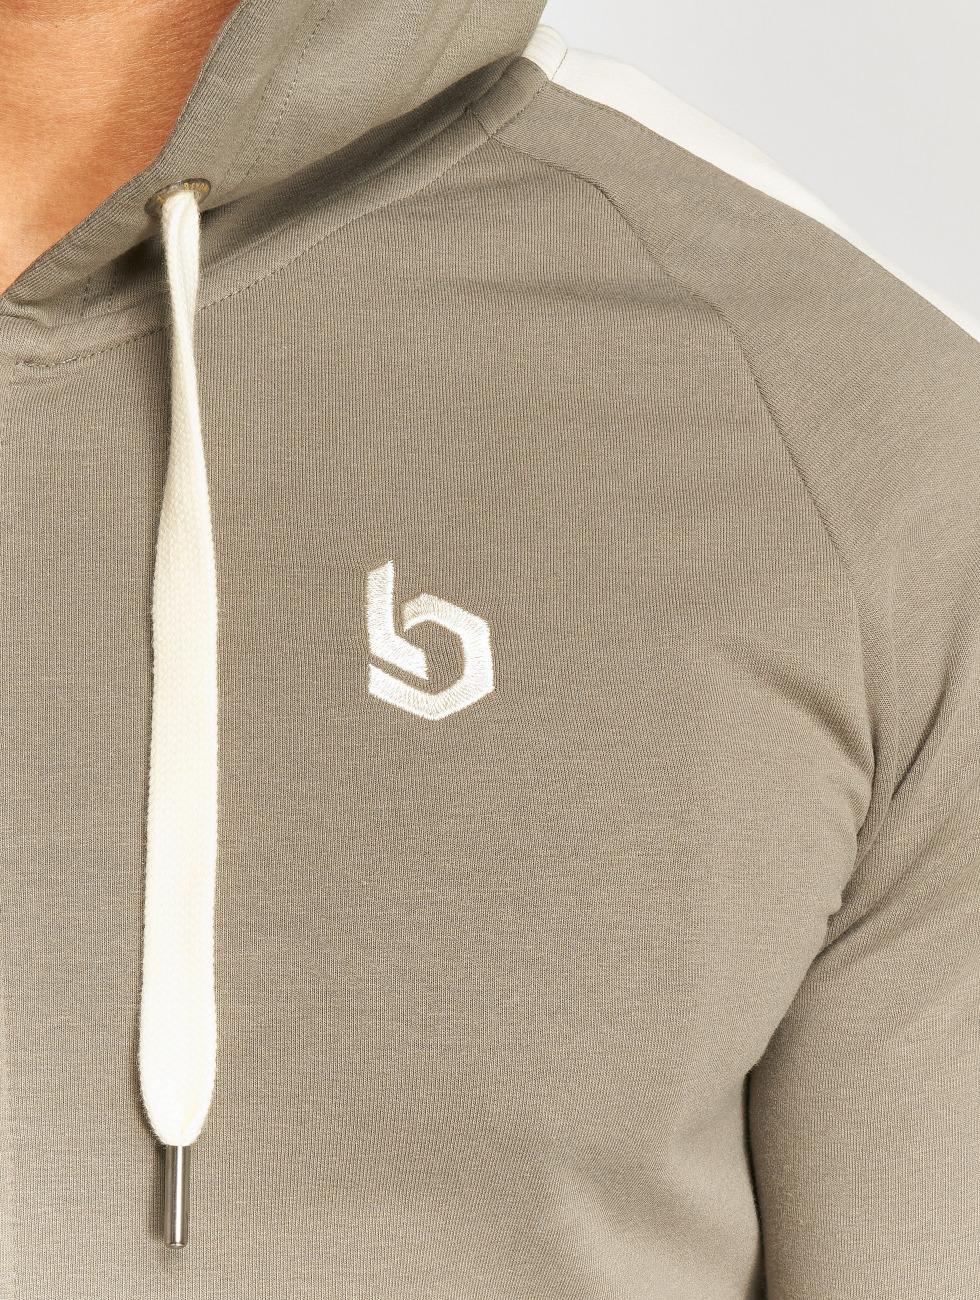 Beyond Limits Sweatvest Foundation khaki